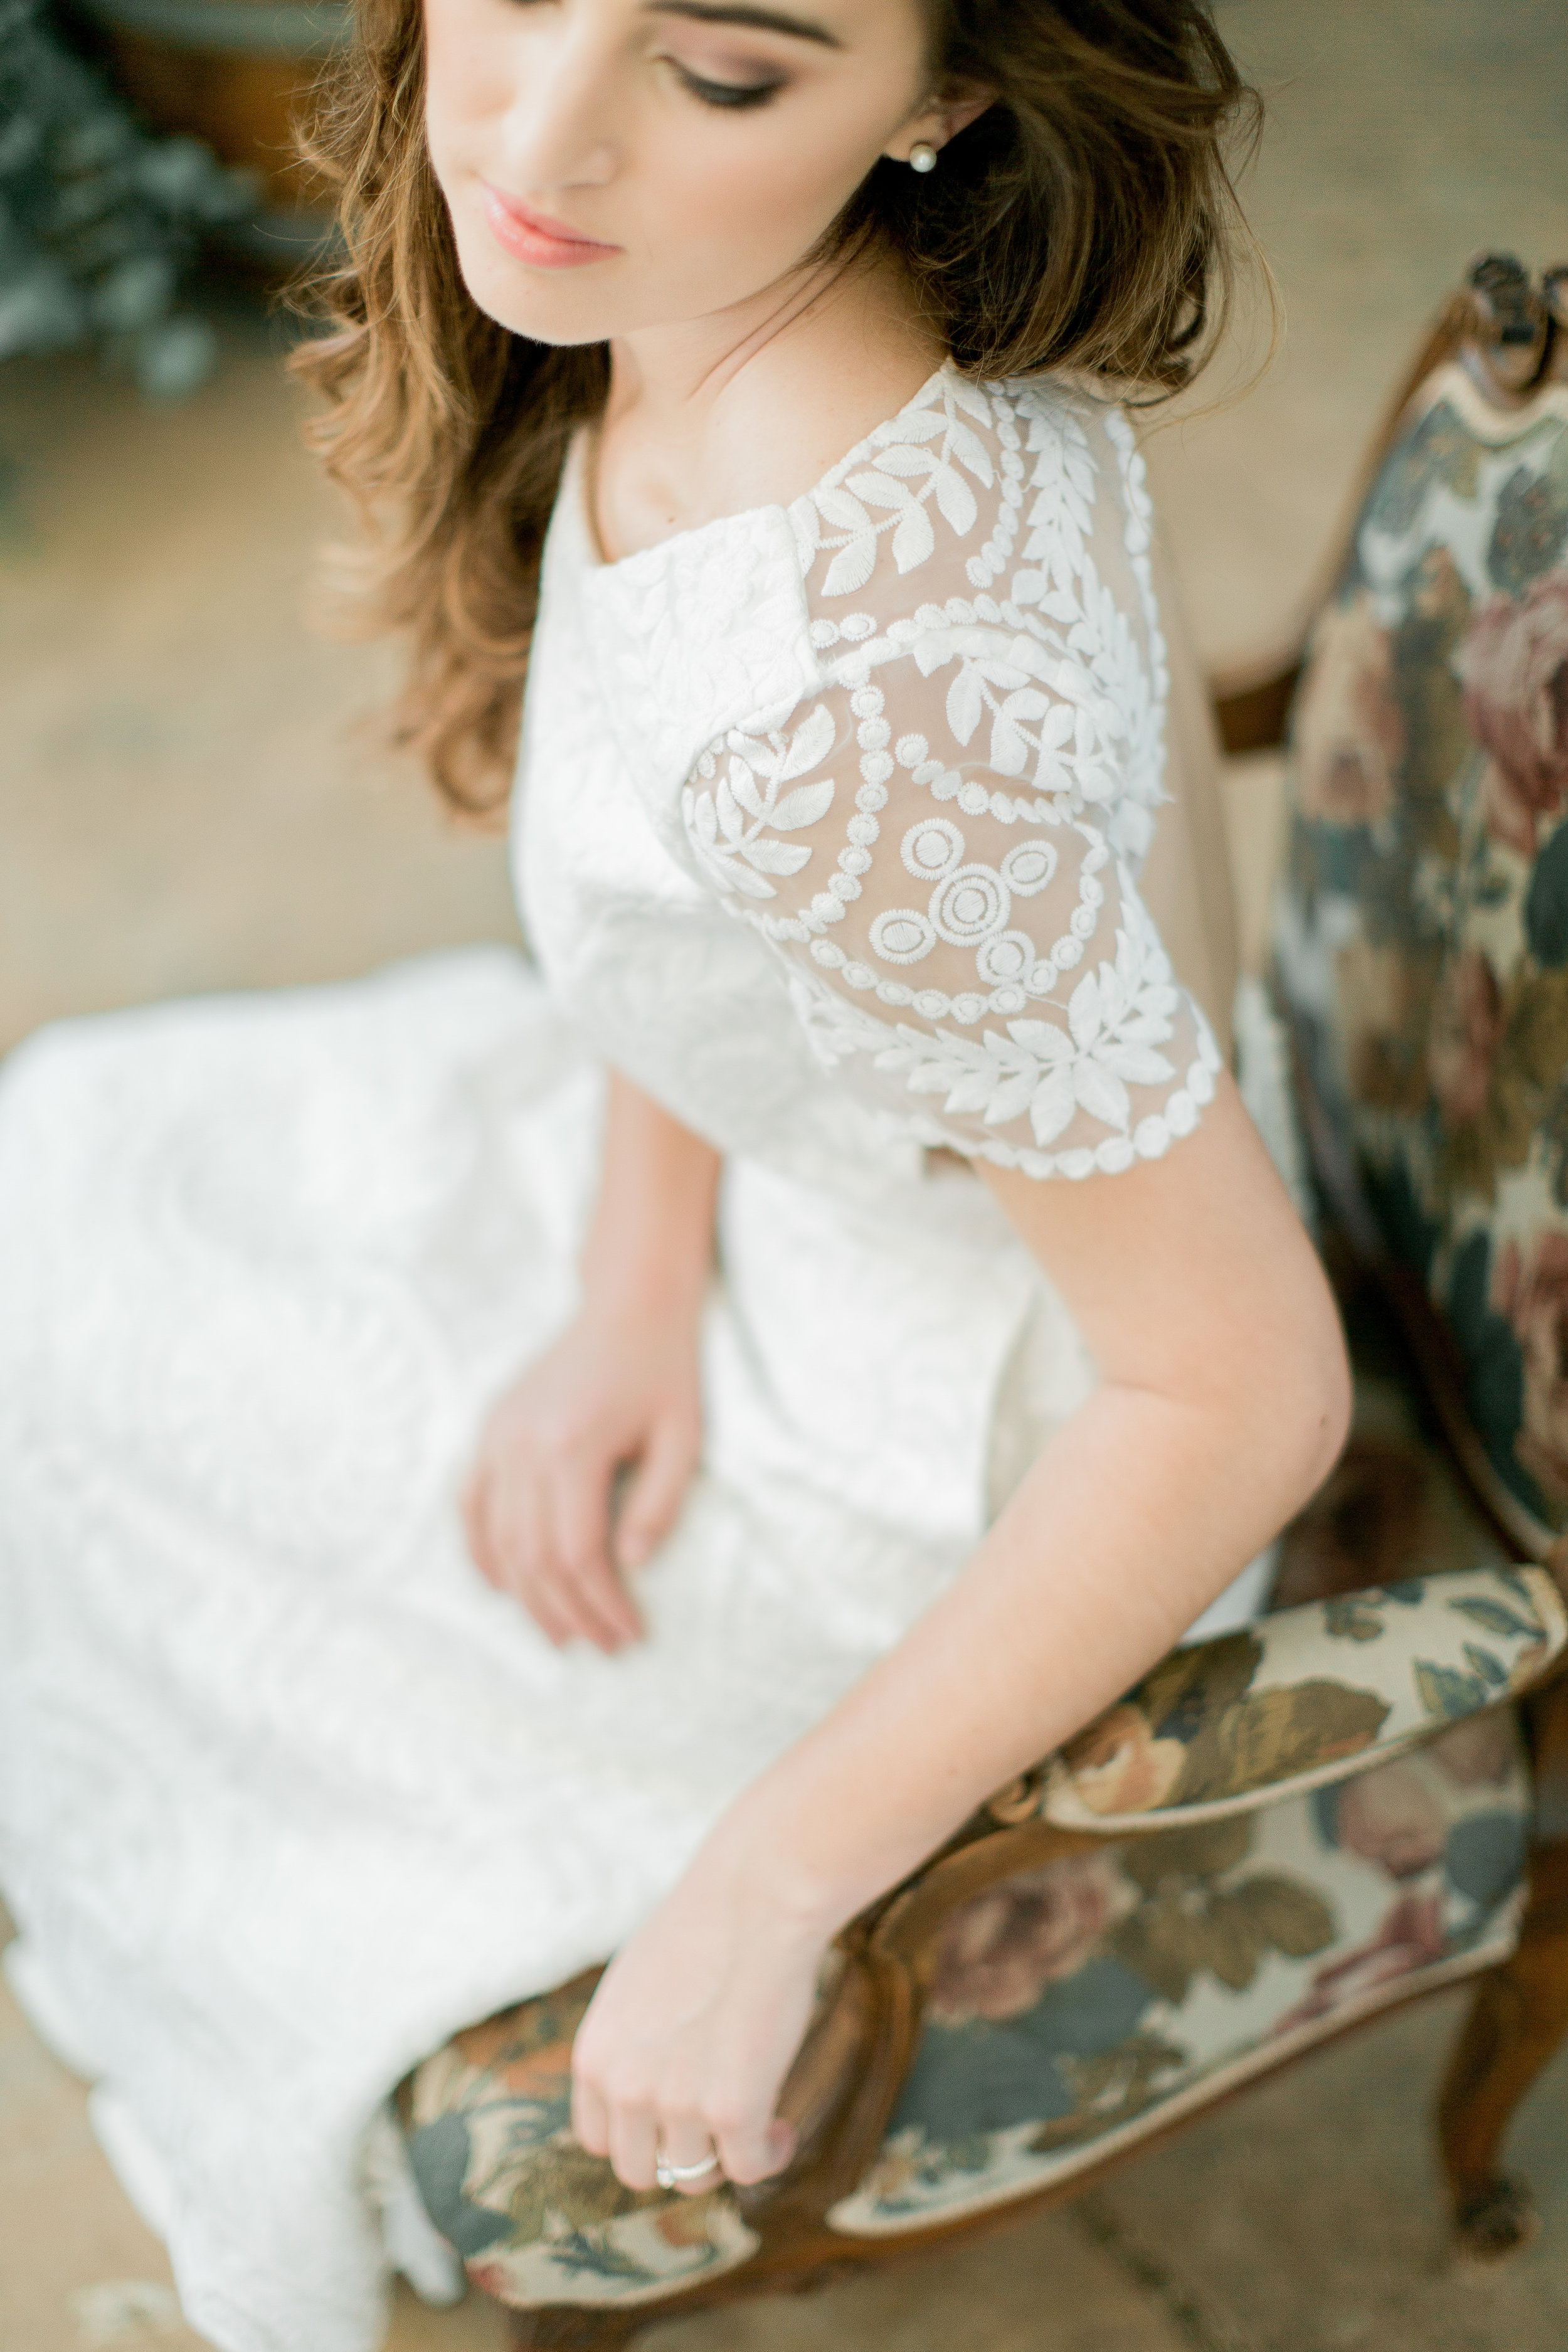 gauteng wedding photographer clareece smit04.jpg